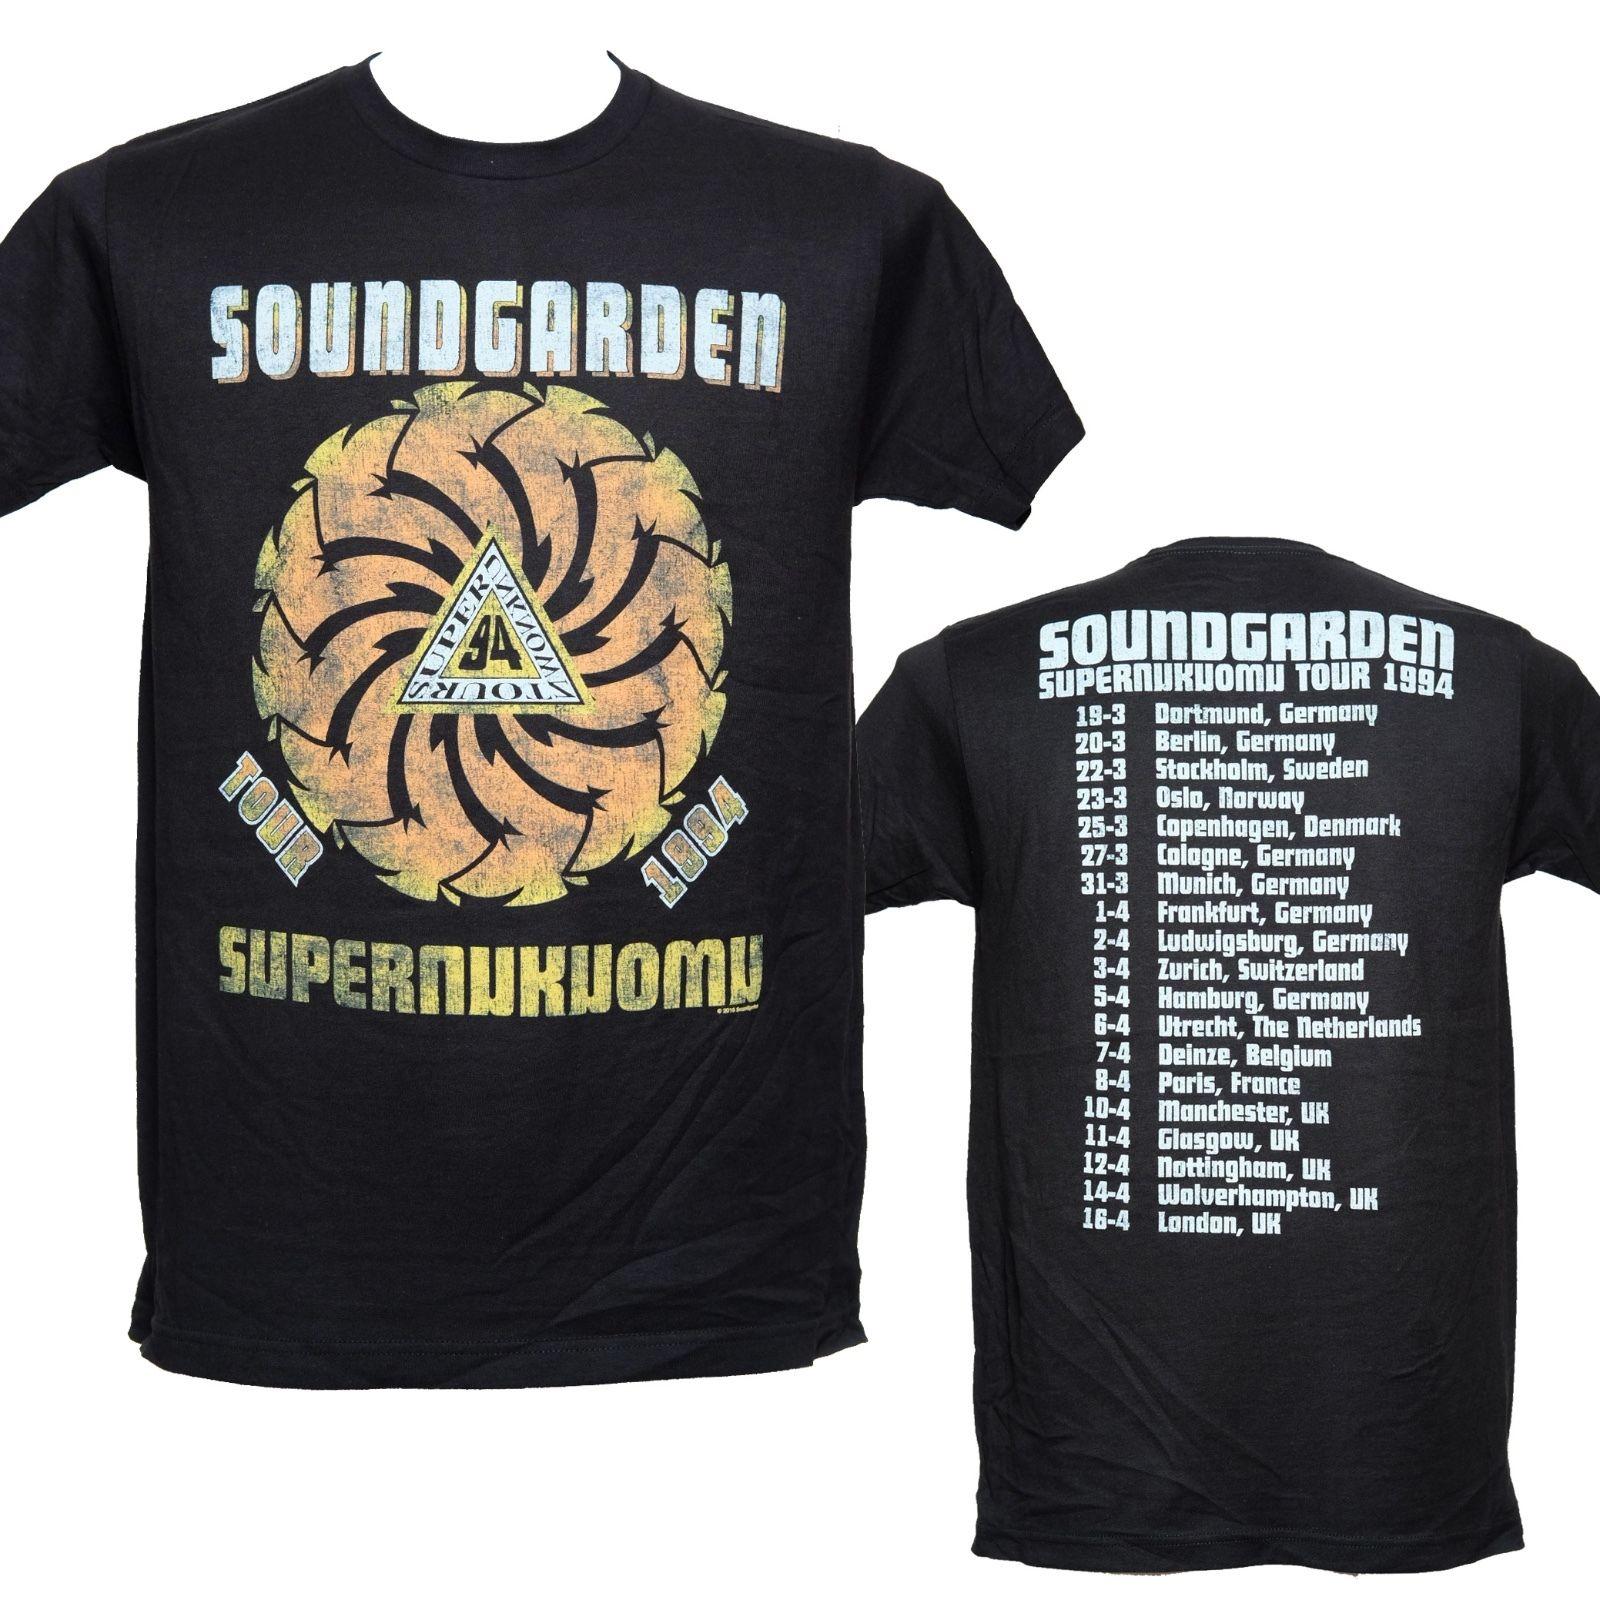 Badmotorfinger T-Shirt 3//4 Sleeve Cute Cotton Tee Black 5//6T Kids Soundgarden